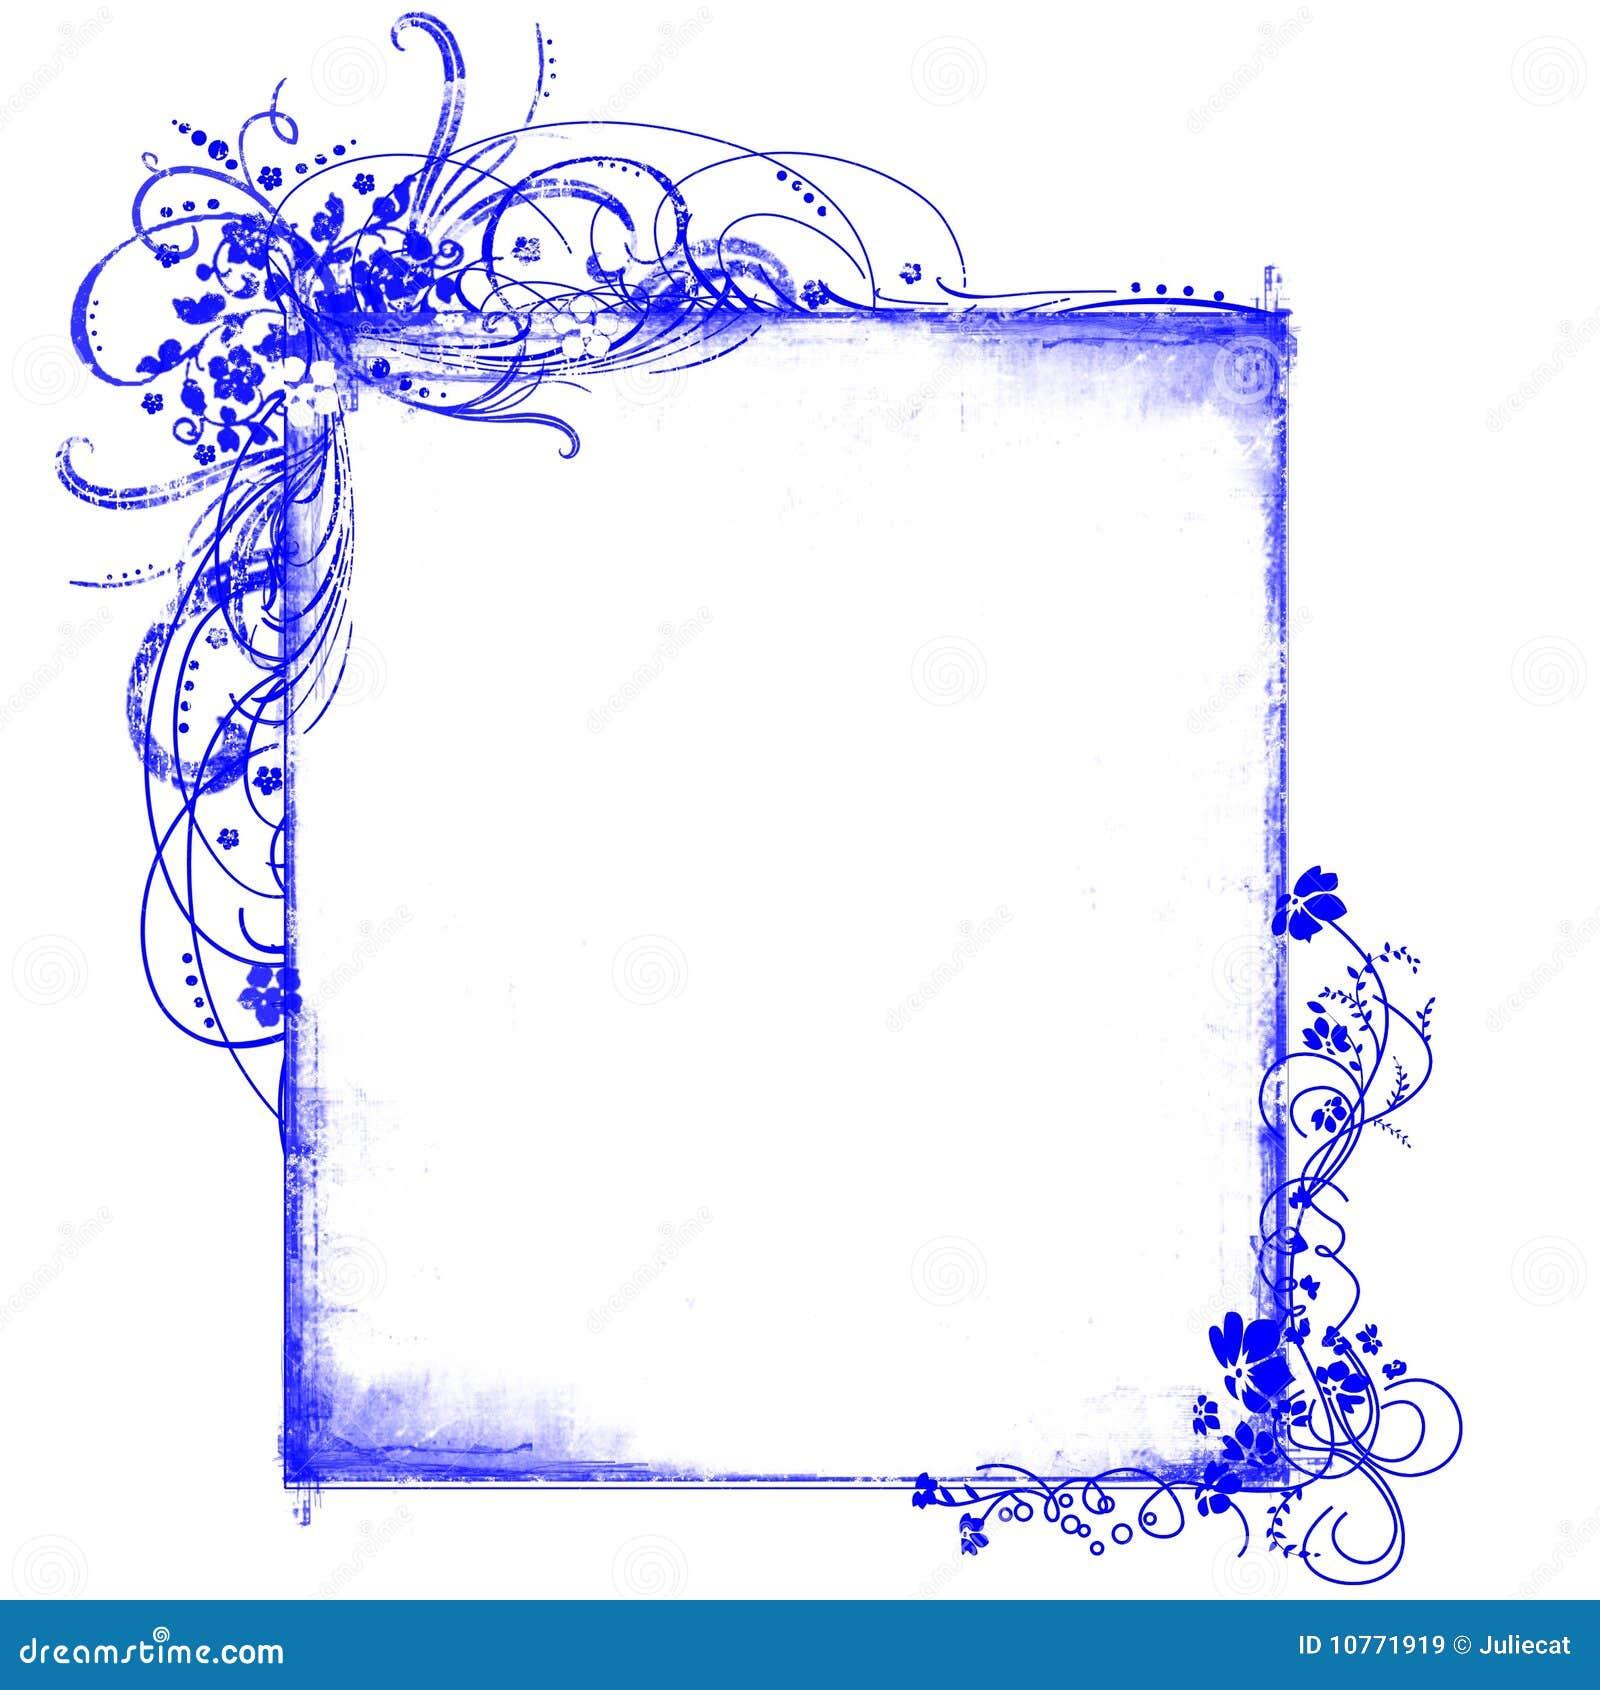 Blank Wedding Invitation Designs for perfect invitations template